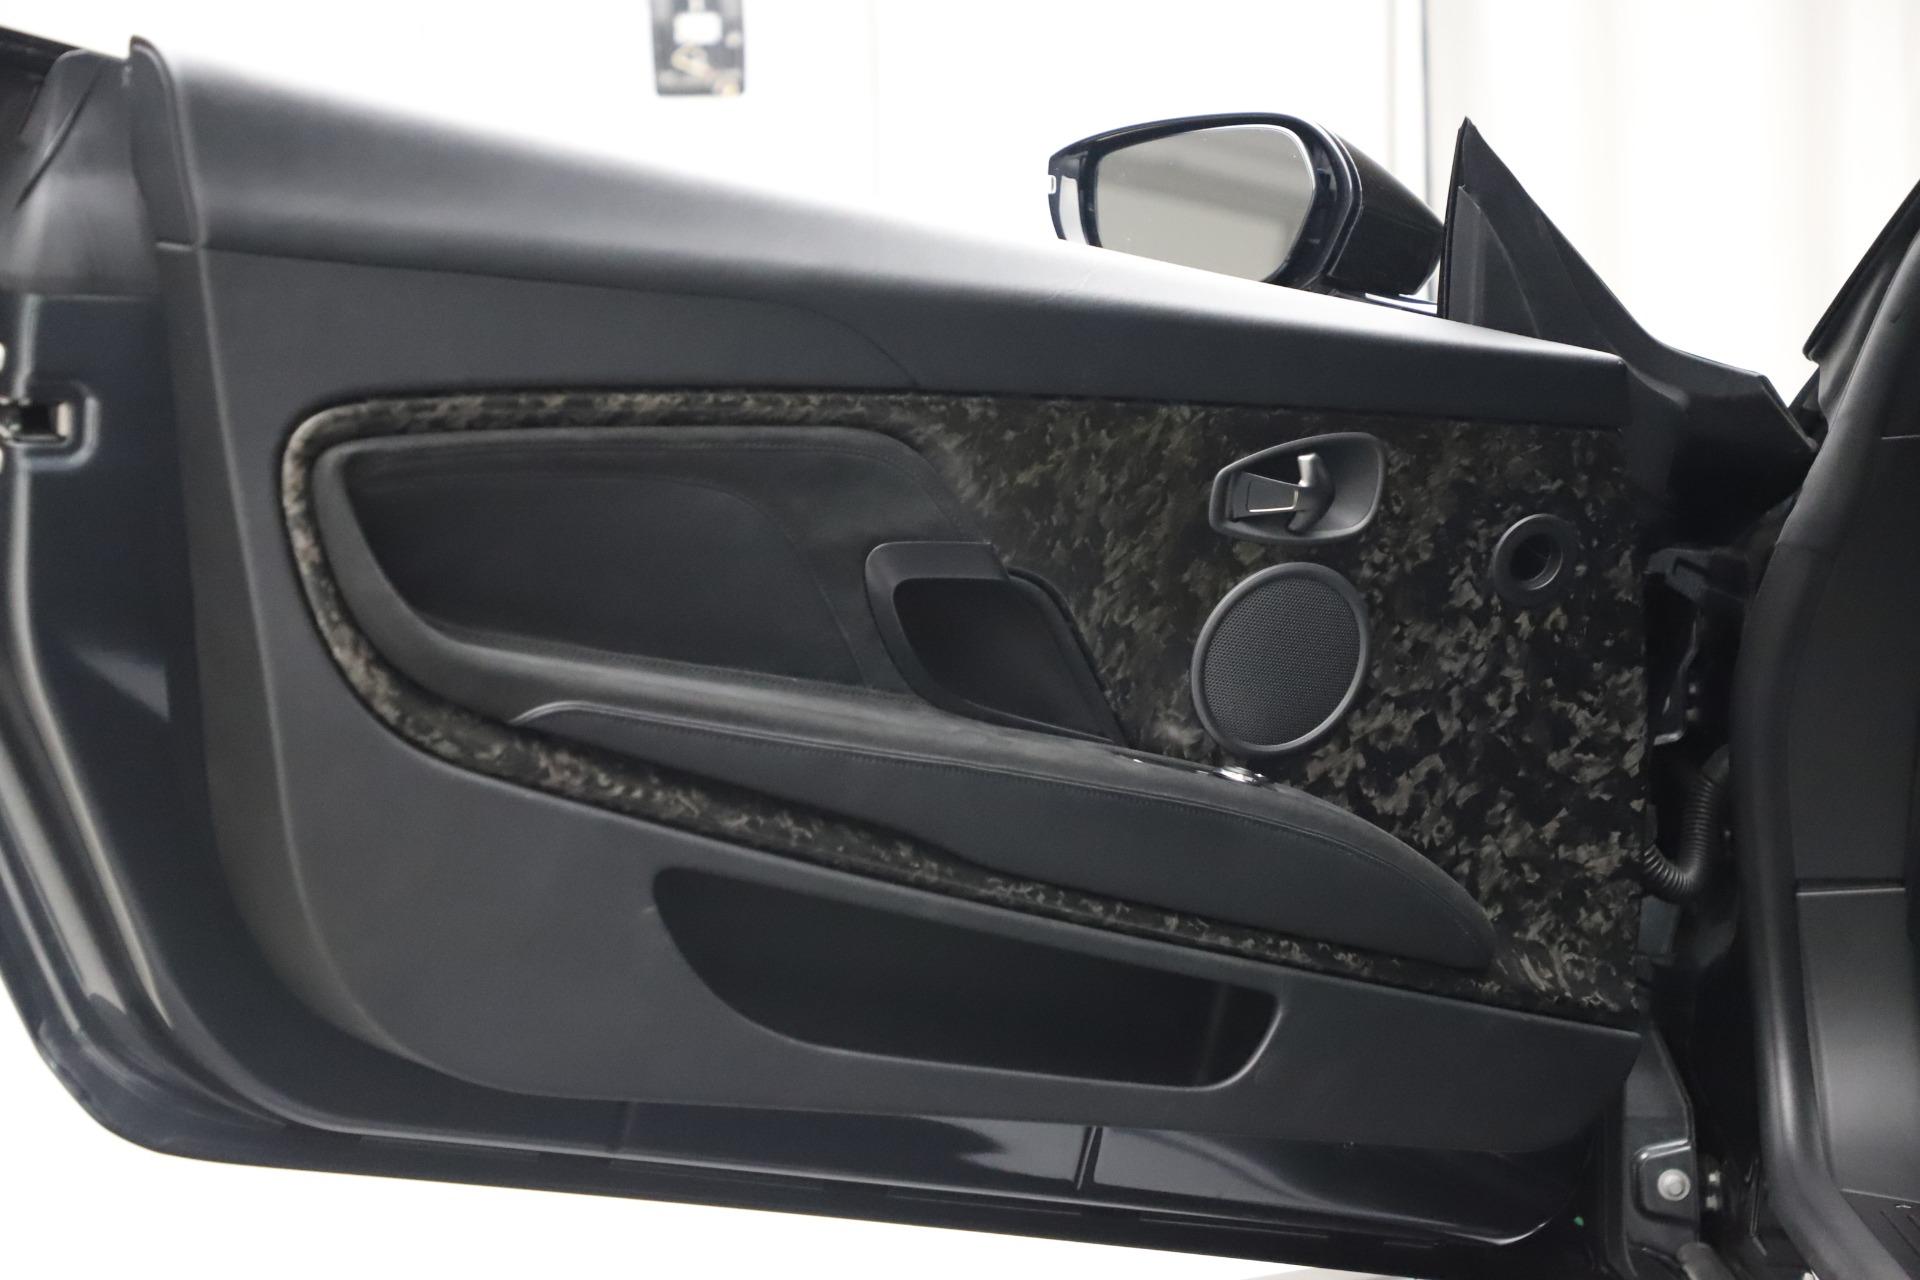 Used 2019 Aston Martin DBS Superleggera Coupe For Sale In Greenwich, CT. Alfa Romeo of Greenwich, A1438B 3570_p18